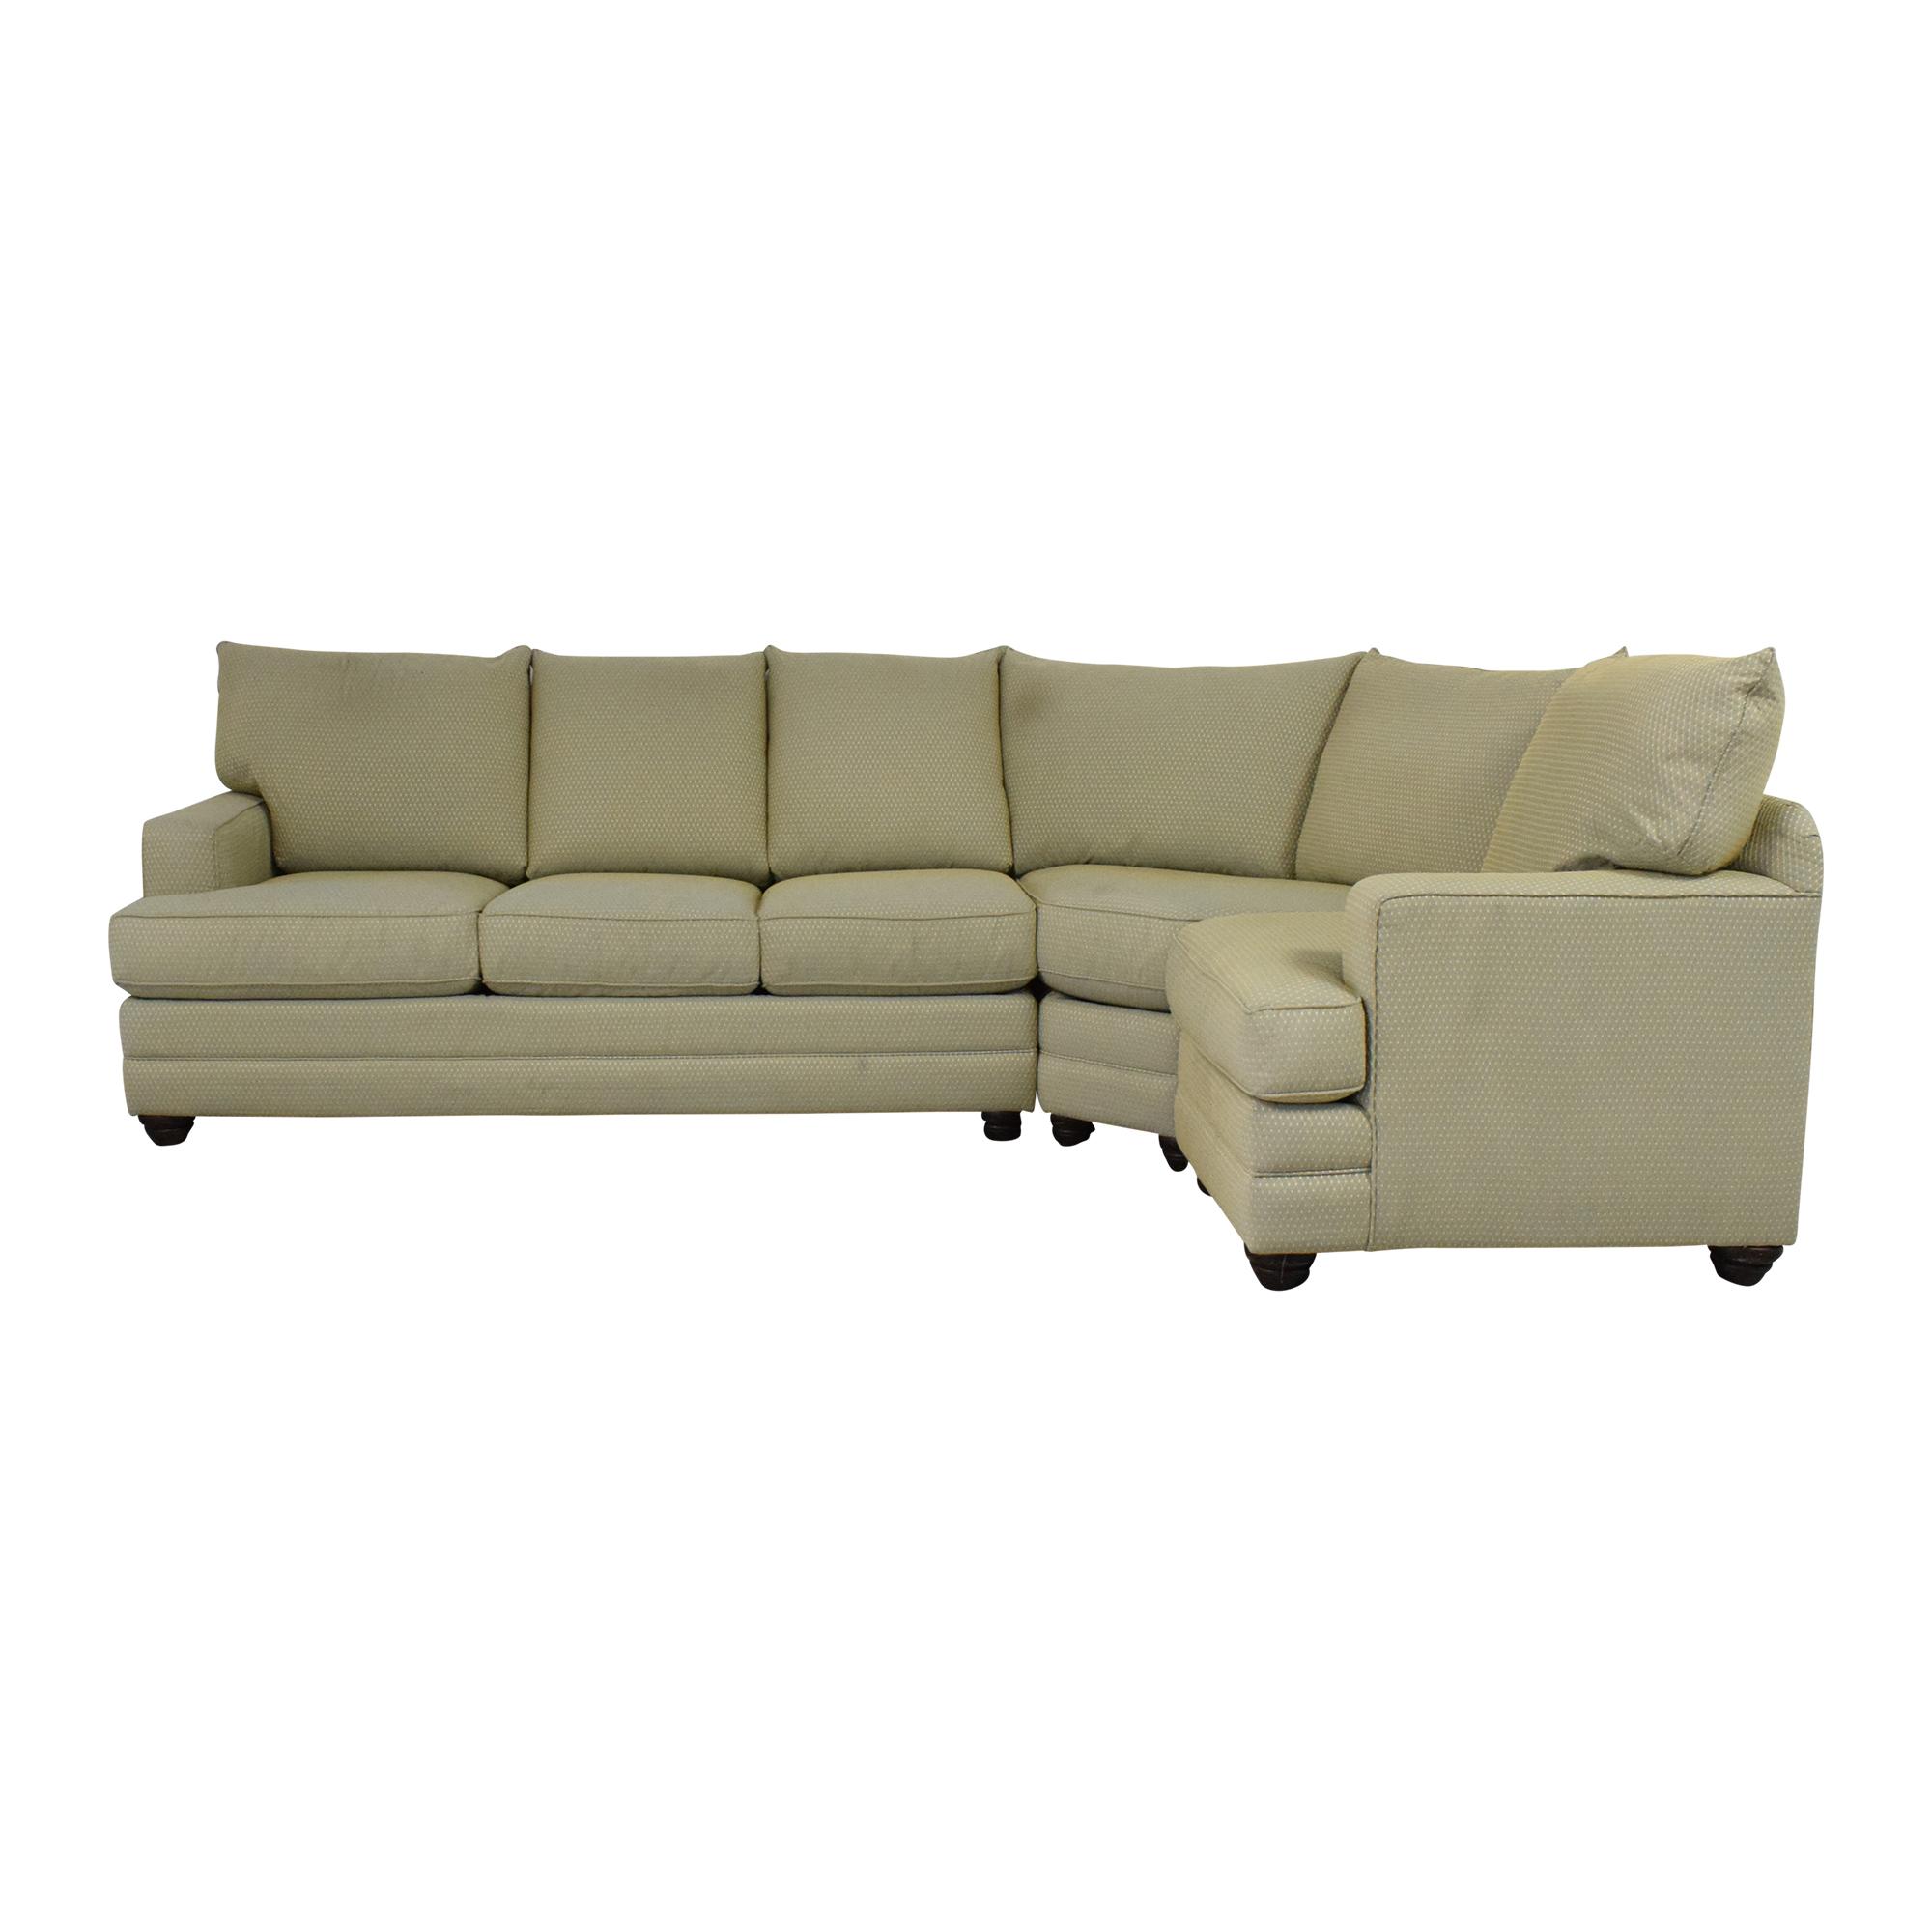 Bassett Furniture Corner Sectional Sofa sale